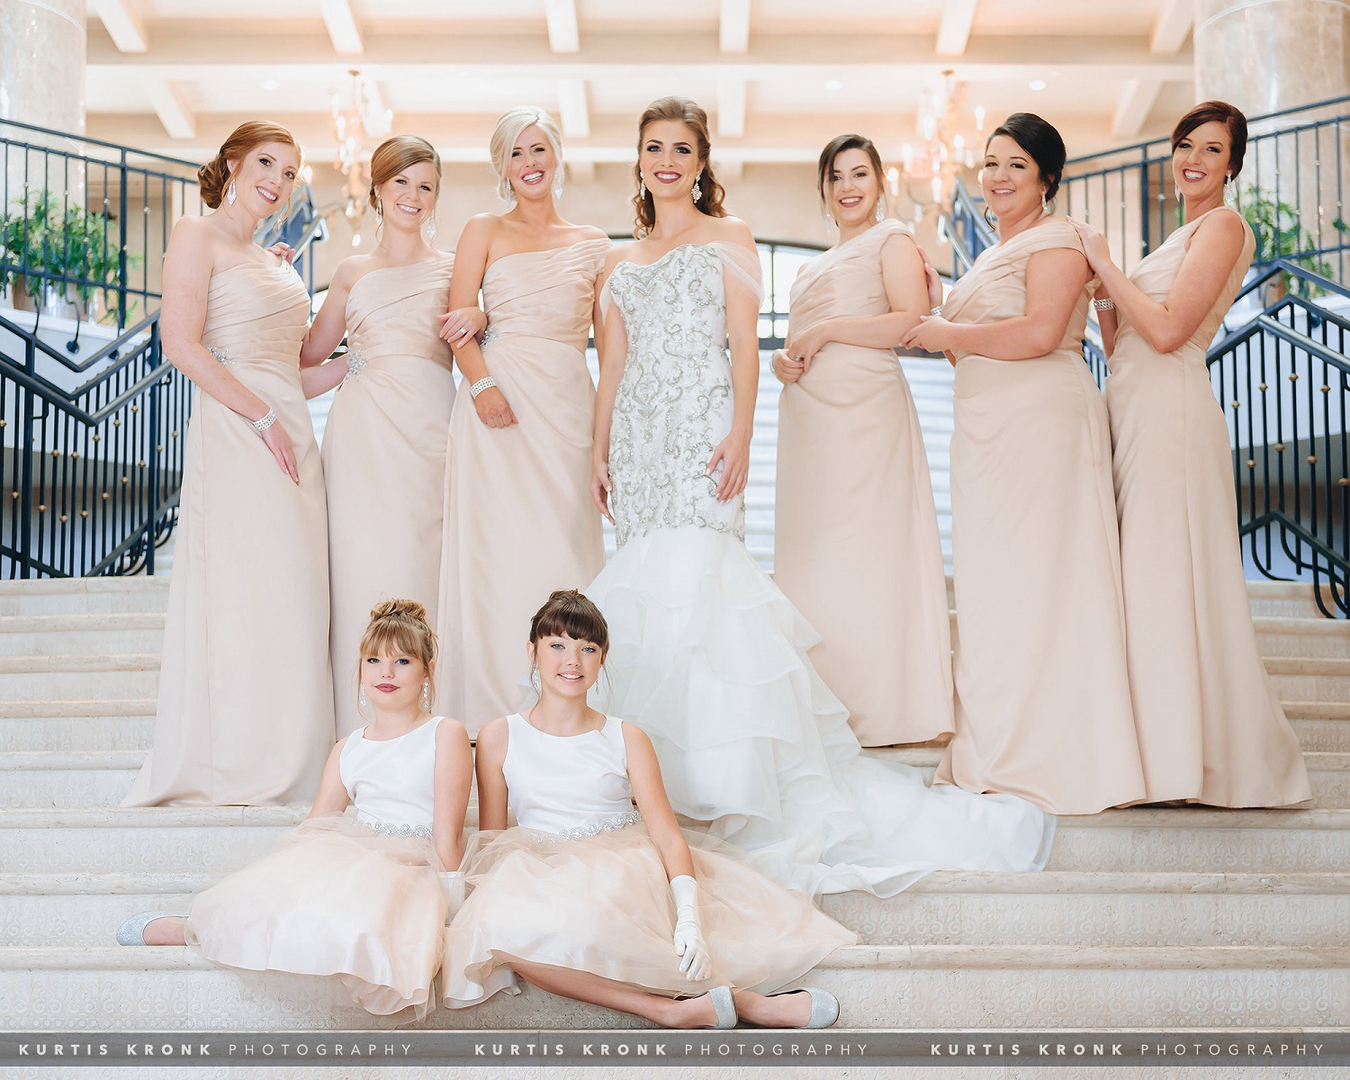 Wedding Dresses, Bridal Accessories - Idothedressido - San Antonio, Tx